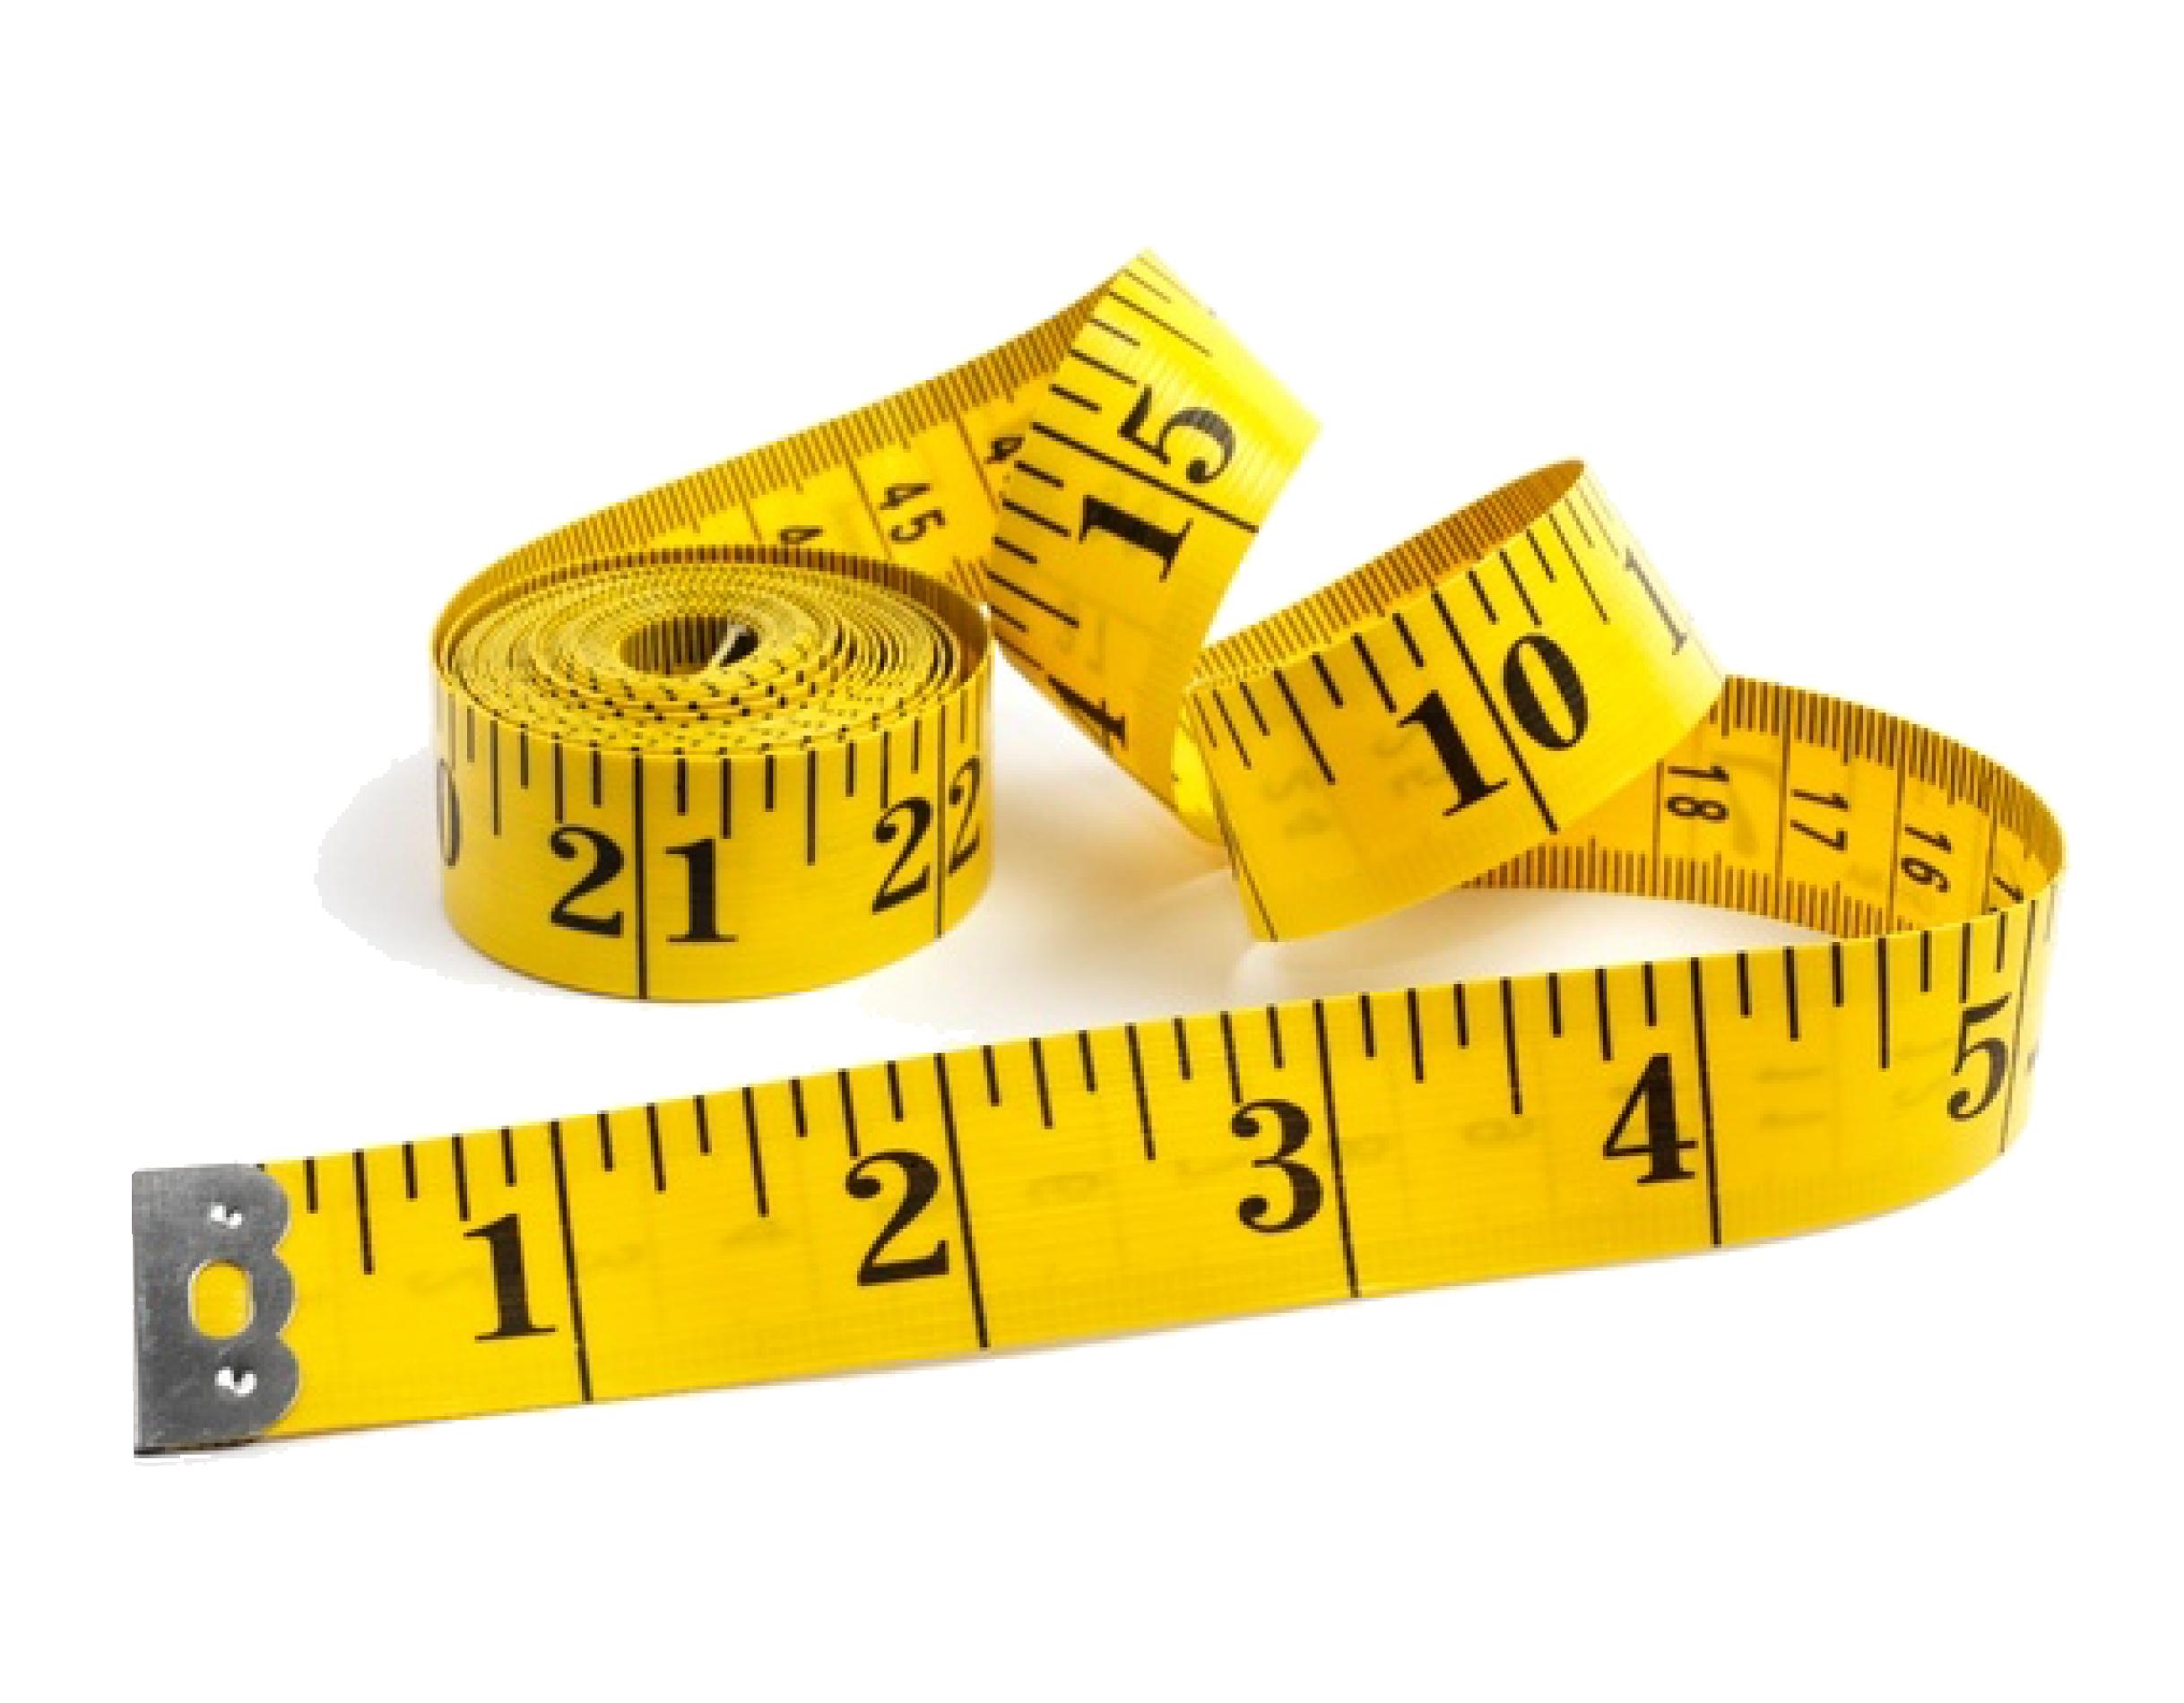 Tape Measures Measurement Hand tool Measuring cup.